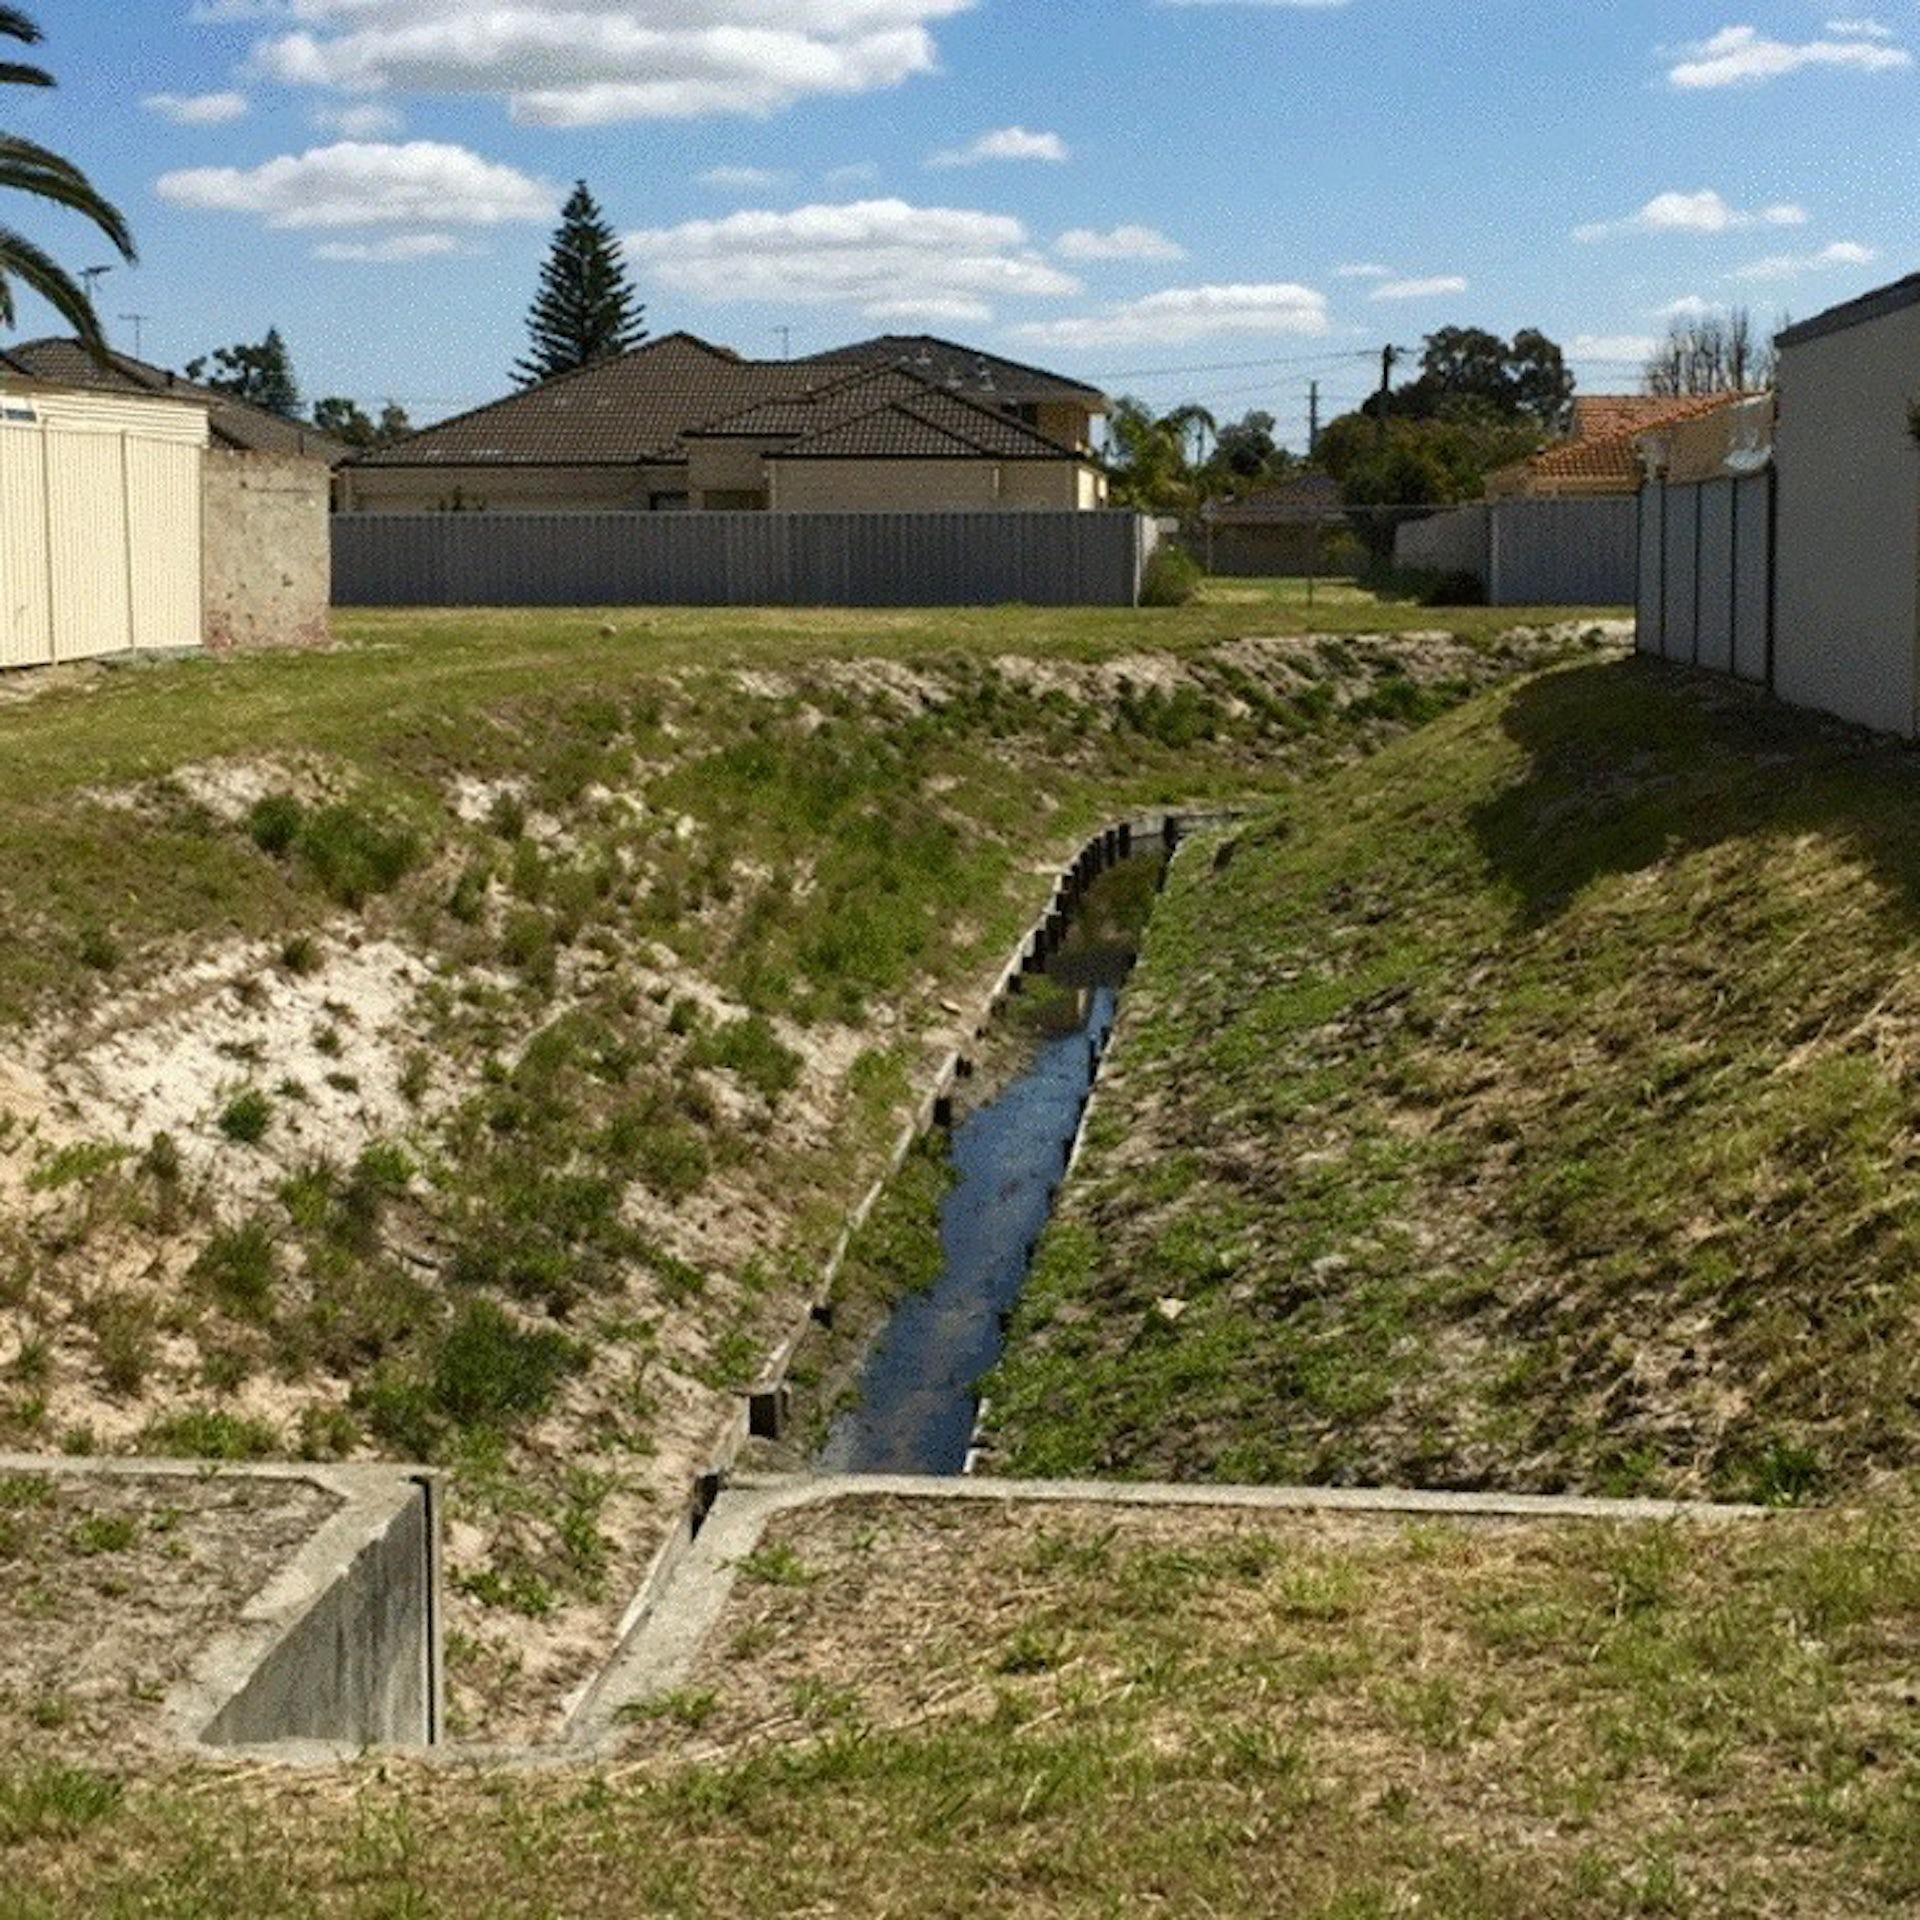 Image of an open suburban drain